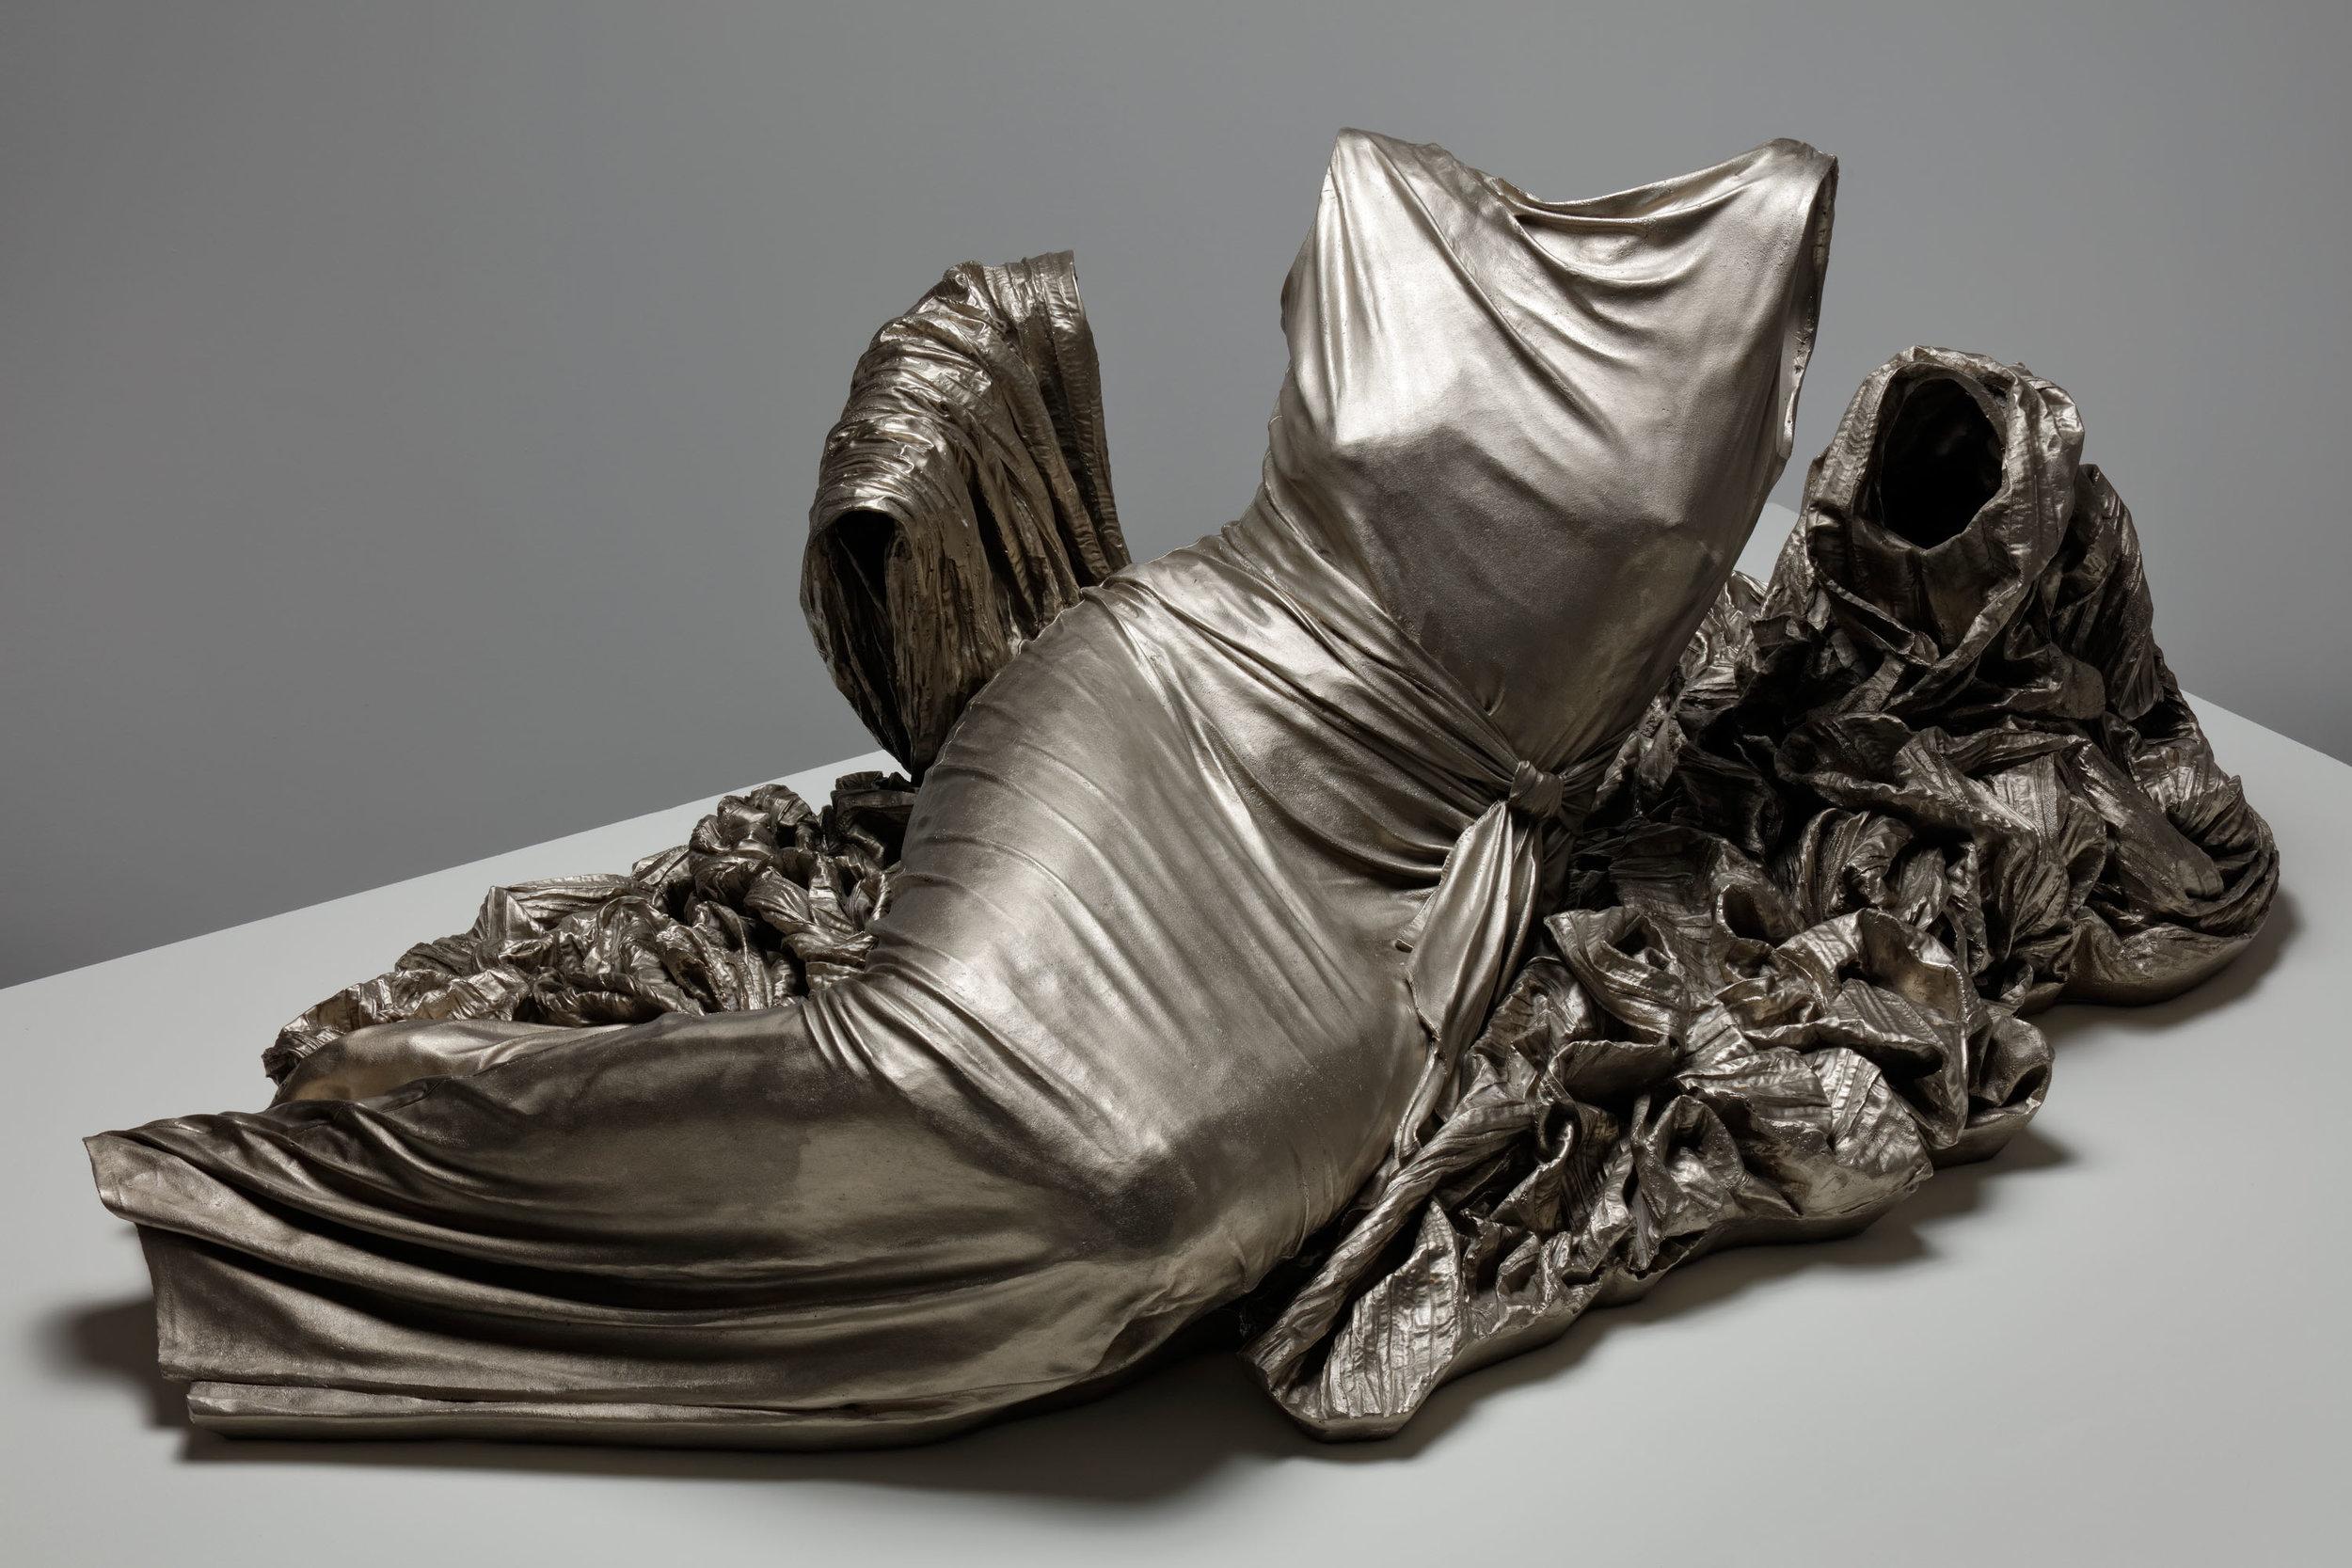 Reclining Nocturne 3, 1/3,  2015, white bronze, 22 2/5 x 59 x 31 in.